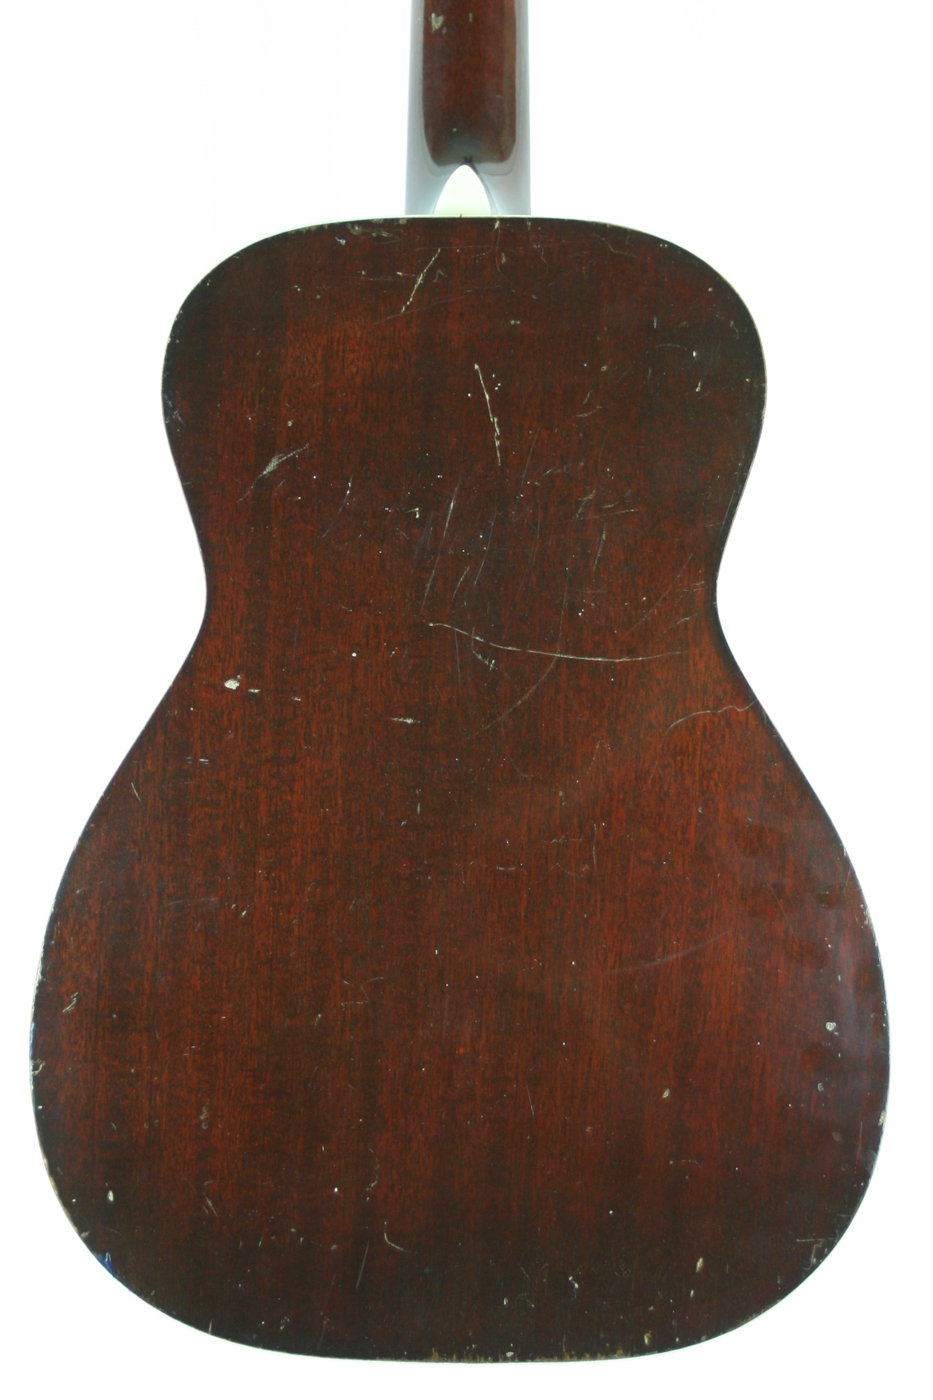 1960s Regal/Harmony Parlor Acoustic detail 2